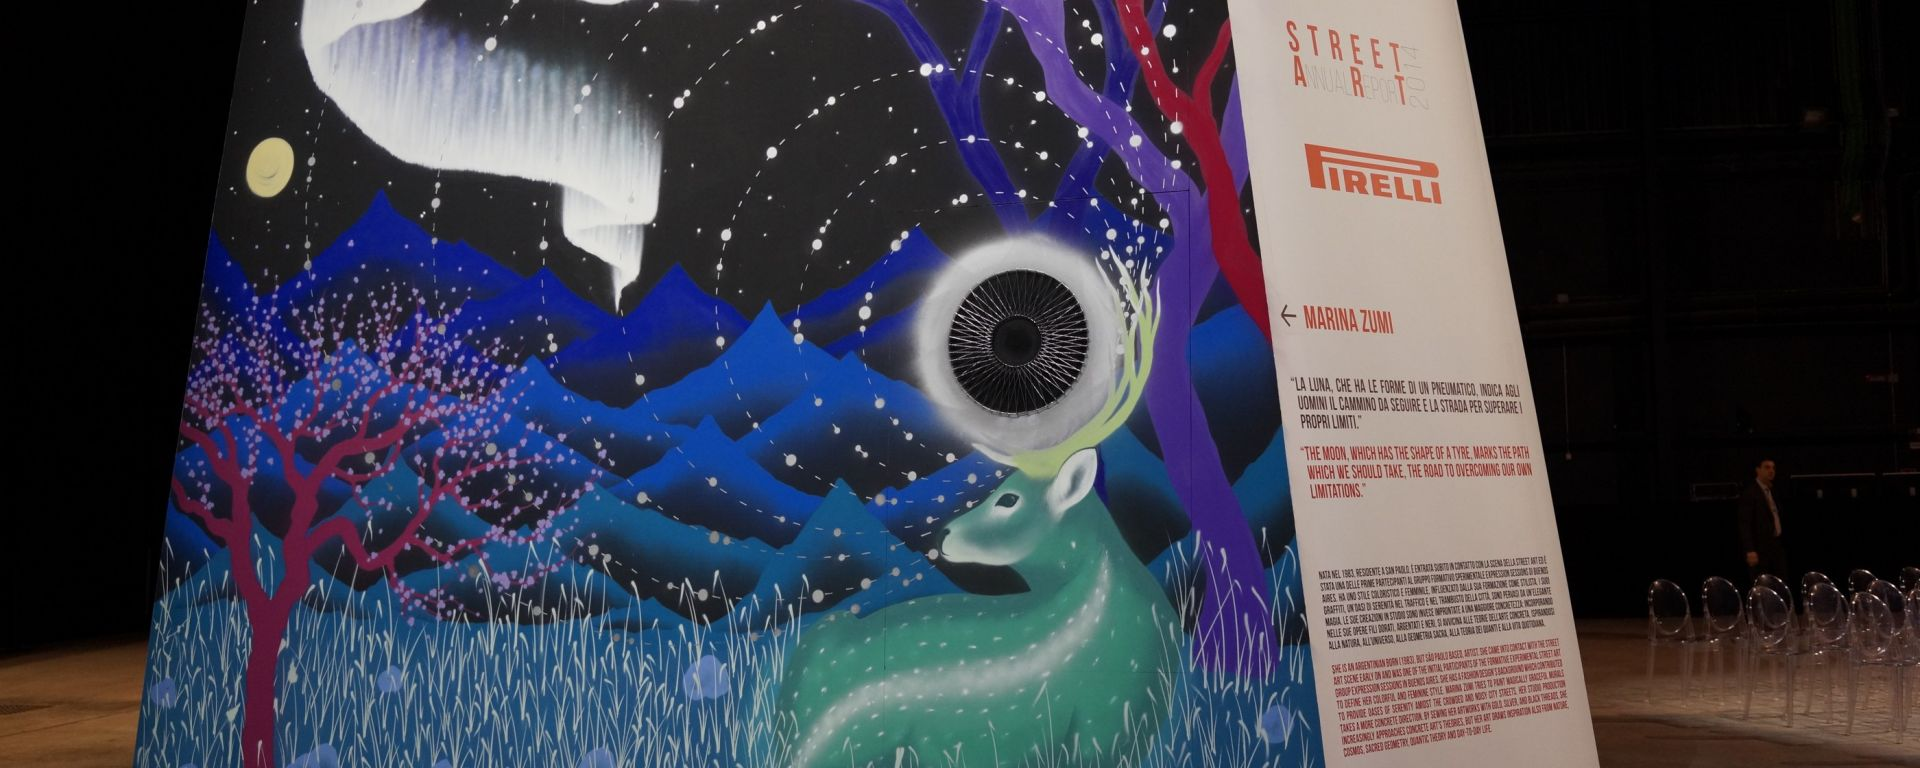 Pirelli: lo pneumatico diventa street art